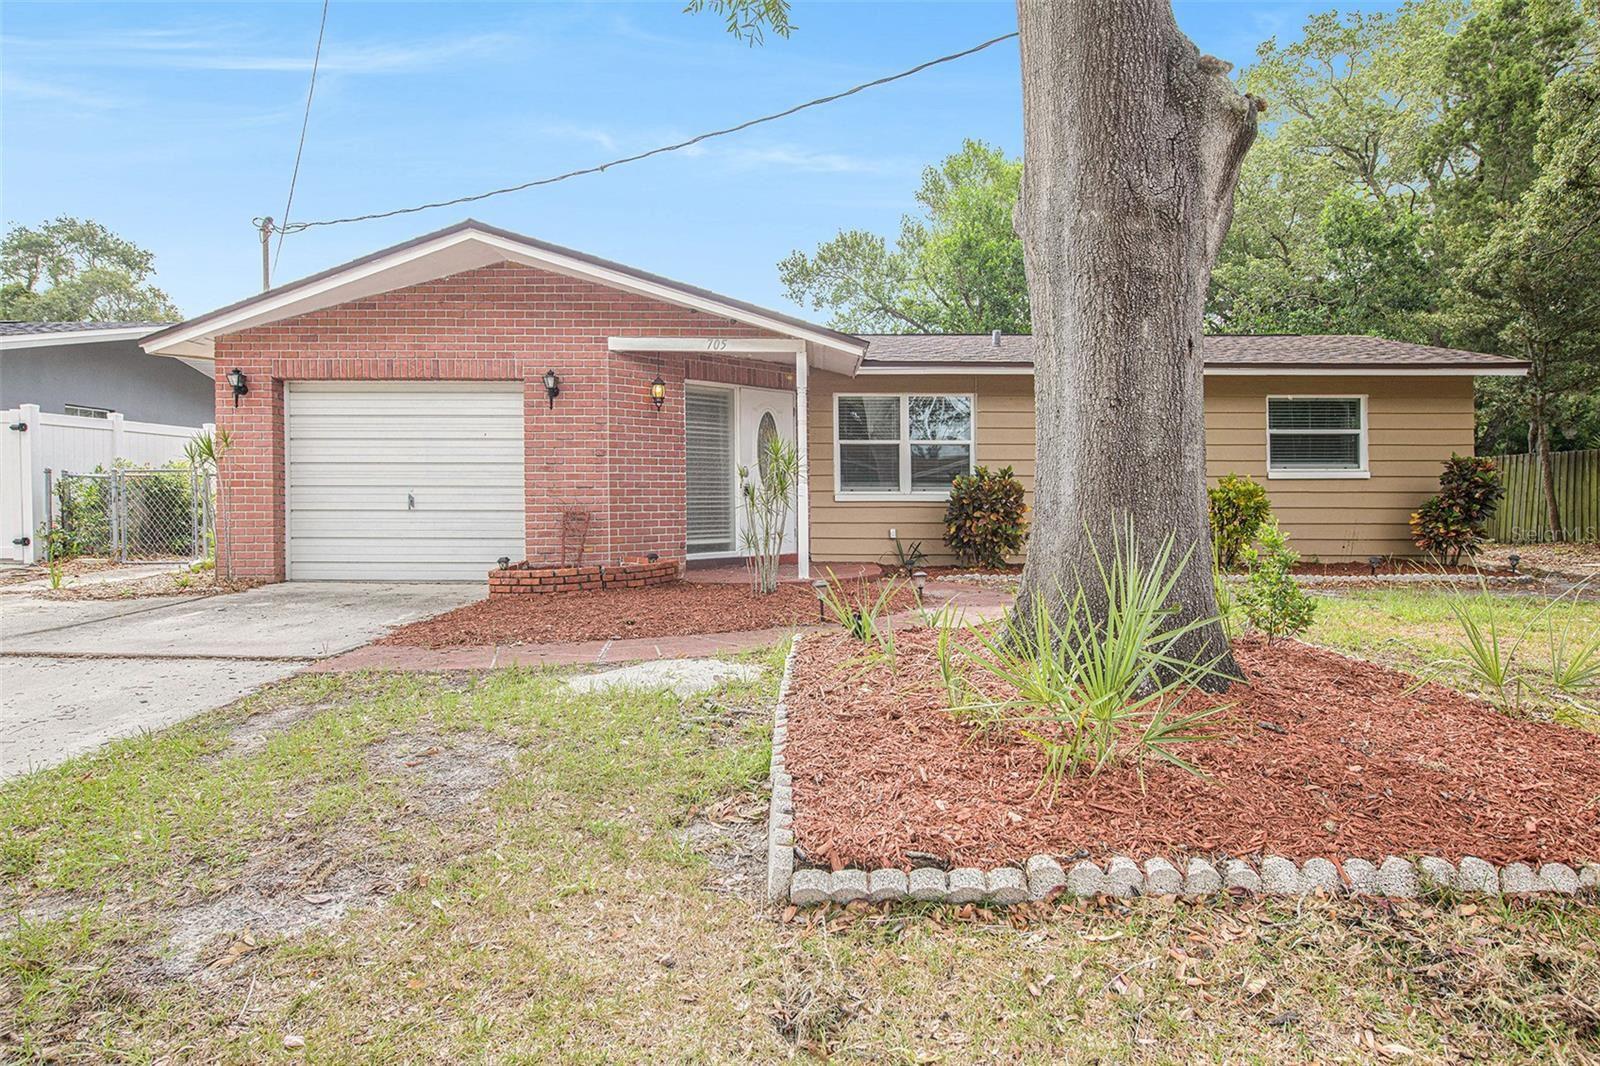 705 CANTERBURY ROAD, Clearwater, FL 33764 - #: O5949727